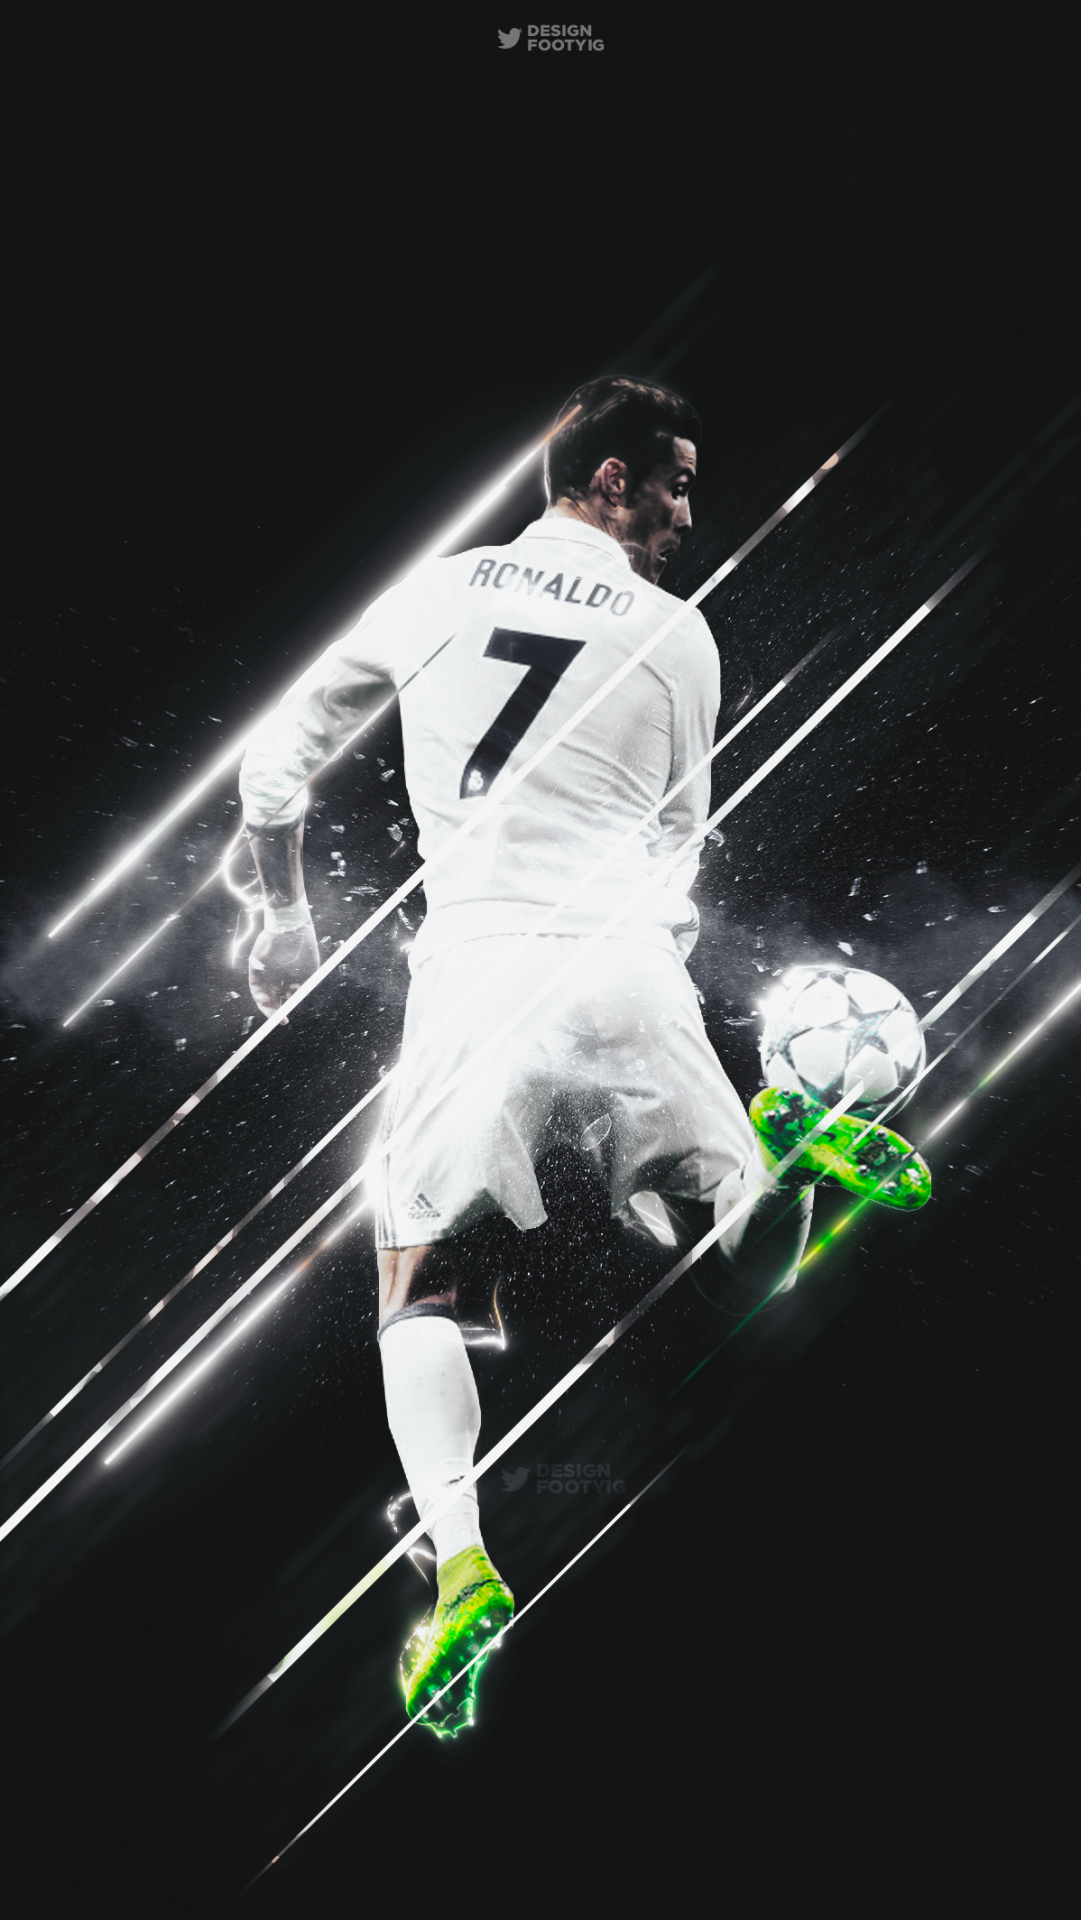 Designdaniel Cristiano Ronaldo Edit Phone Wallpaper By Design Daniel On Tumblr Real Madrid Hala Mad Cristiano Ronaldo Celebration Ronaldo Cristiano Ronaldo